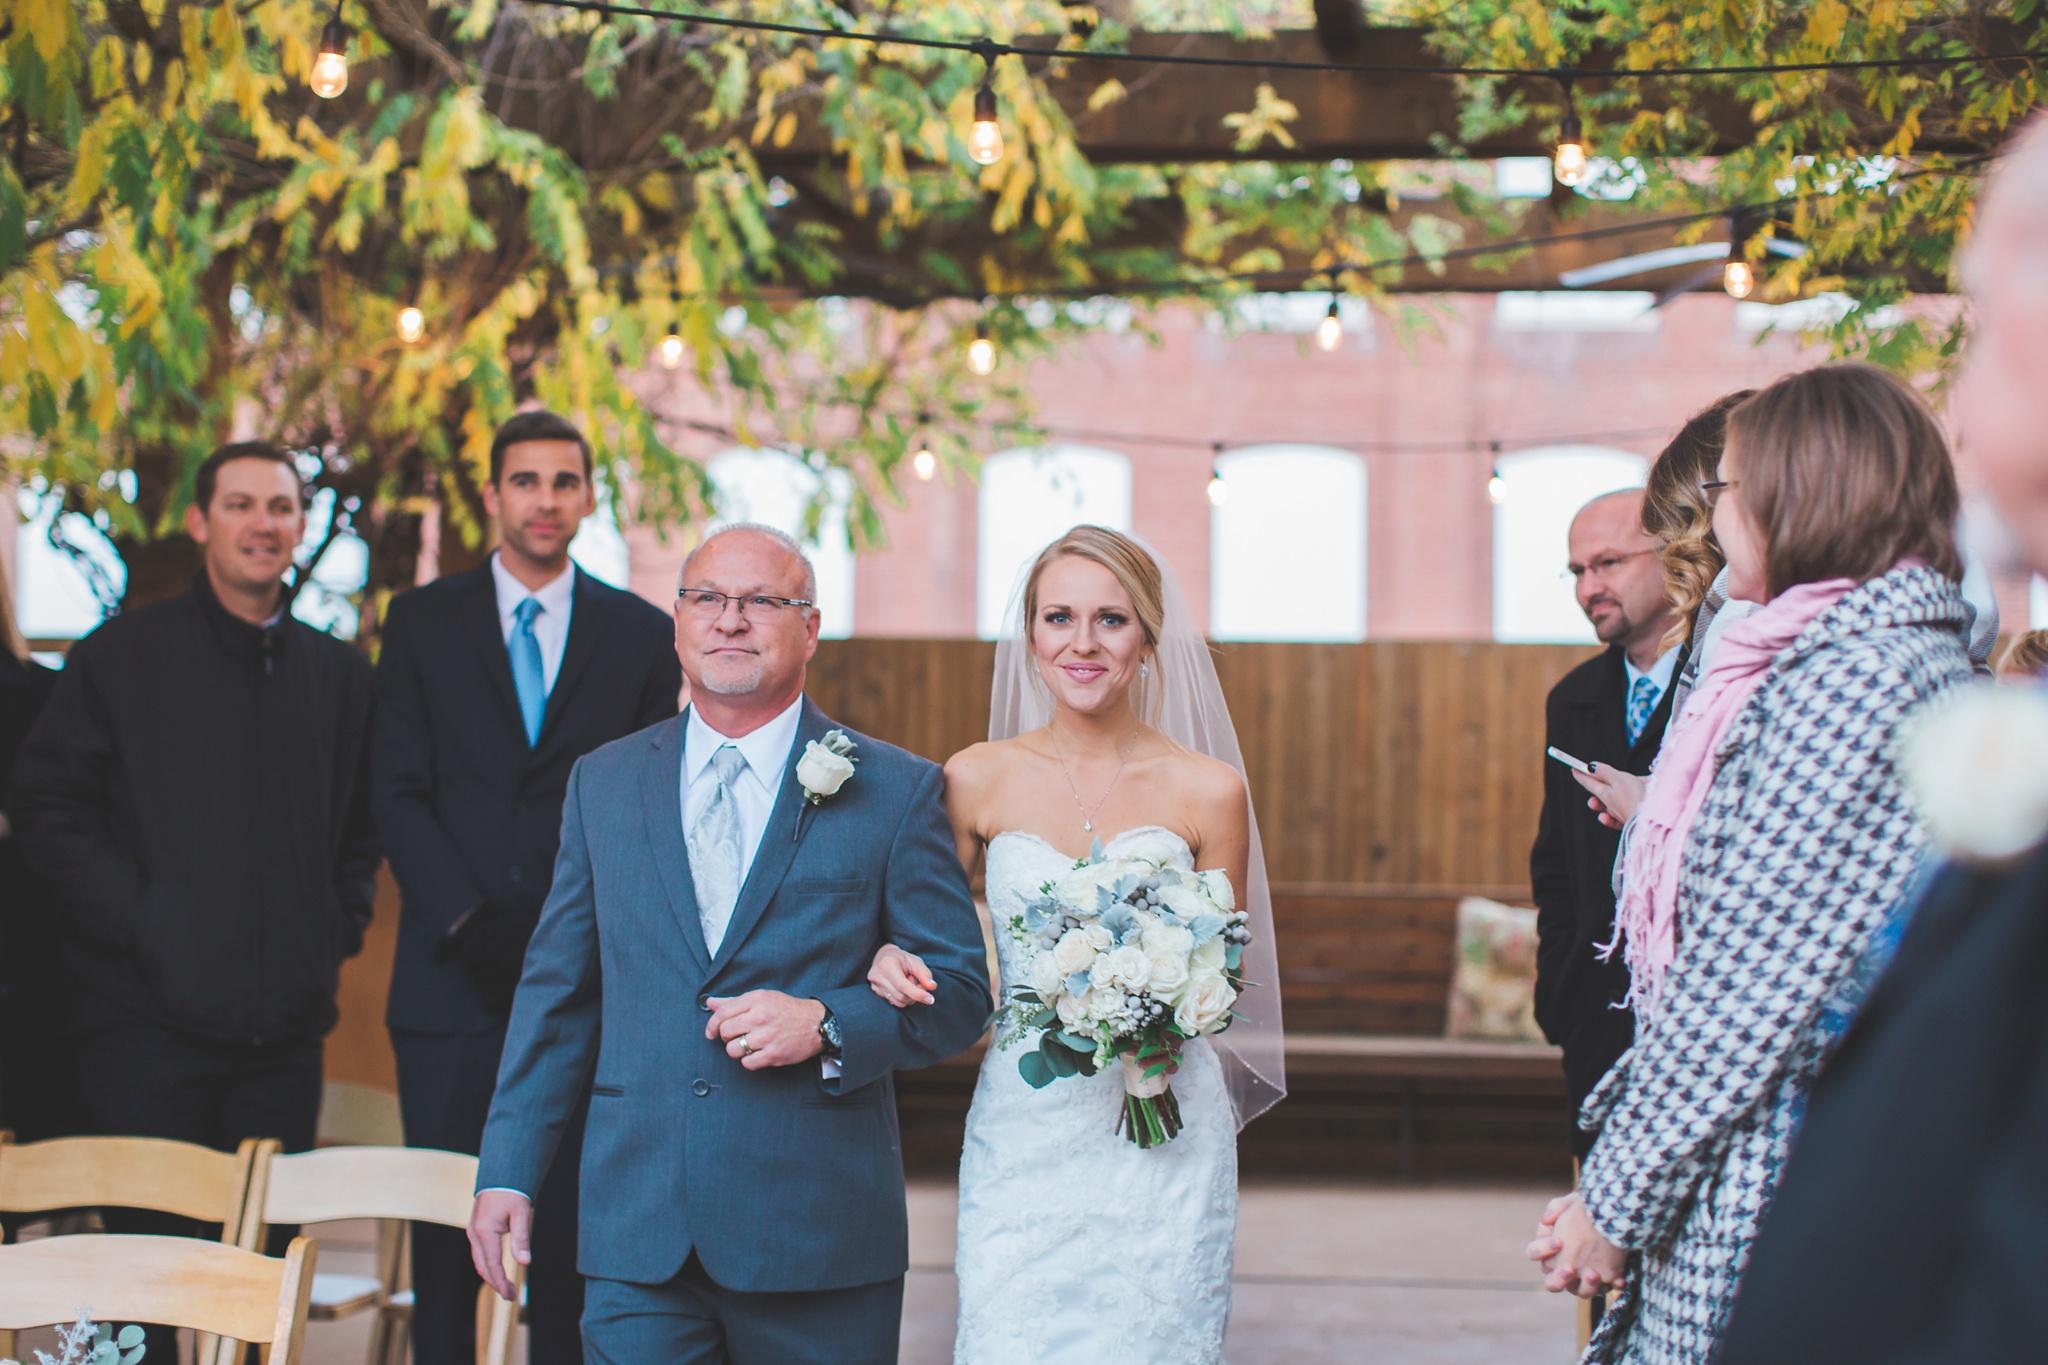 St. Louis Wedding Photographer   Chandler Rose Photography_0047.jpg